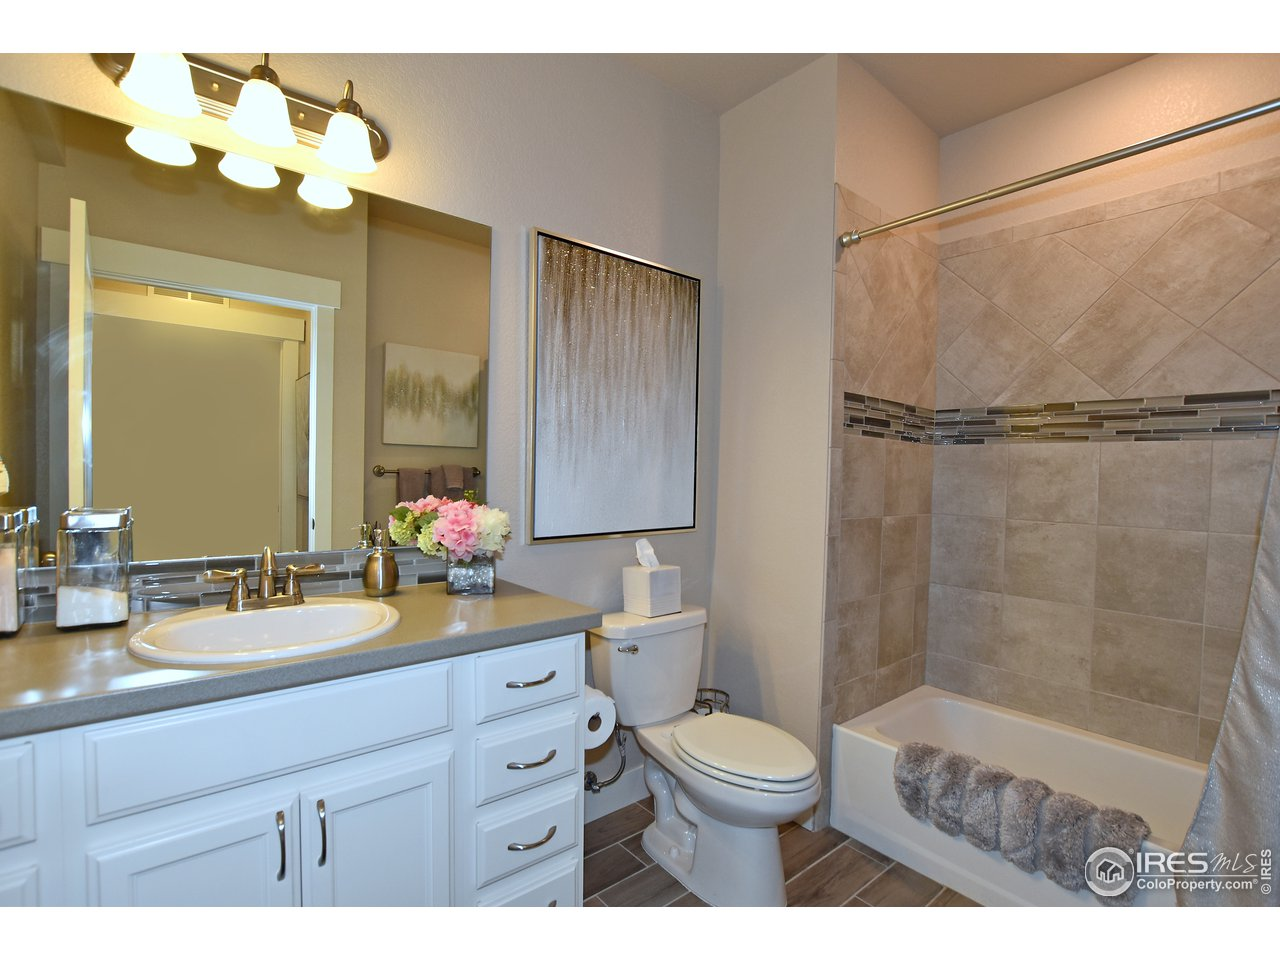 Oversized full bathroom adjacent to 2nd bedroom